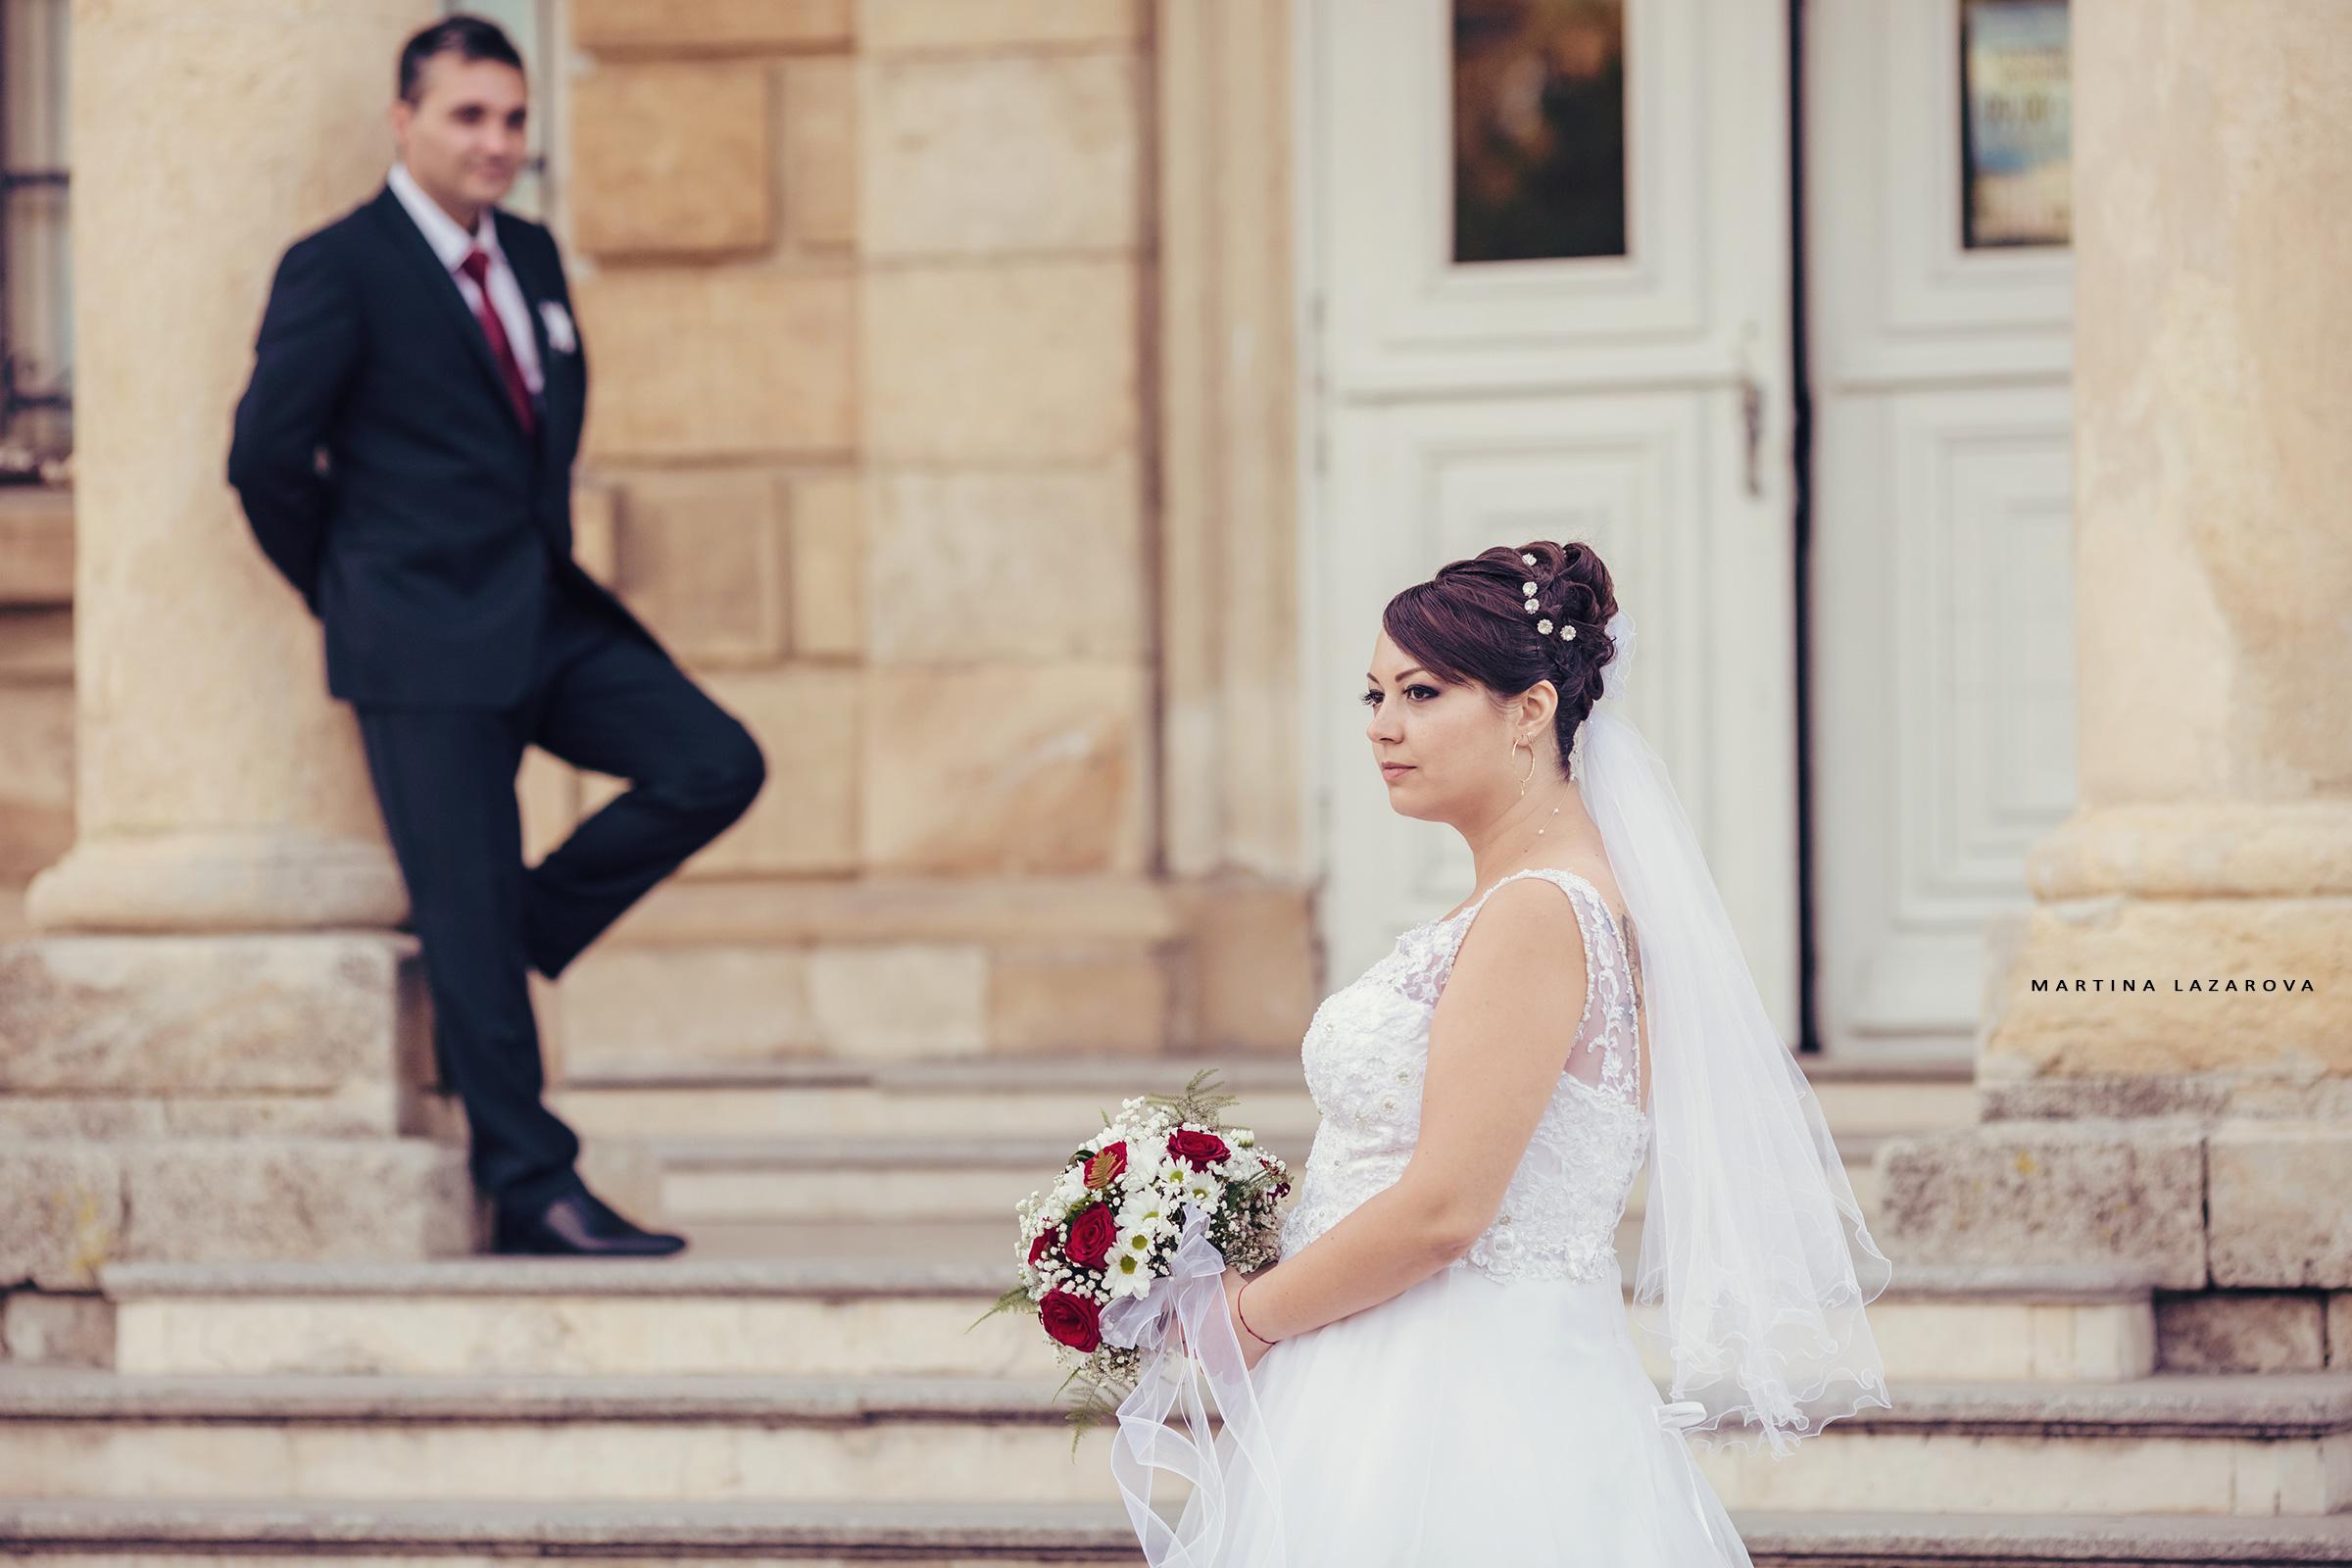 Wedding-K&R-PhotoShoot-53